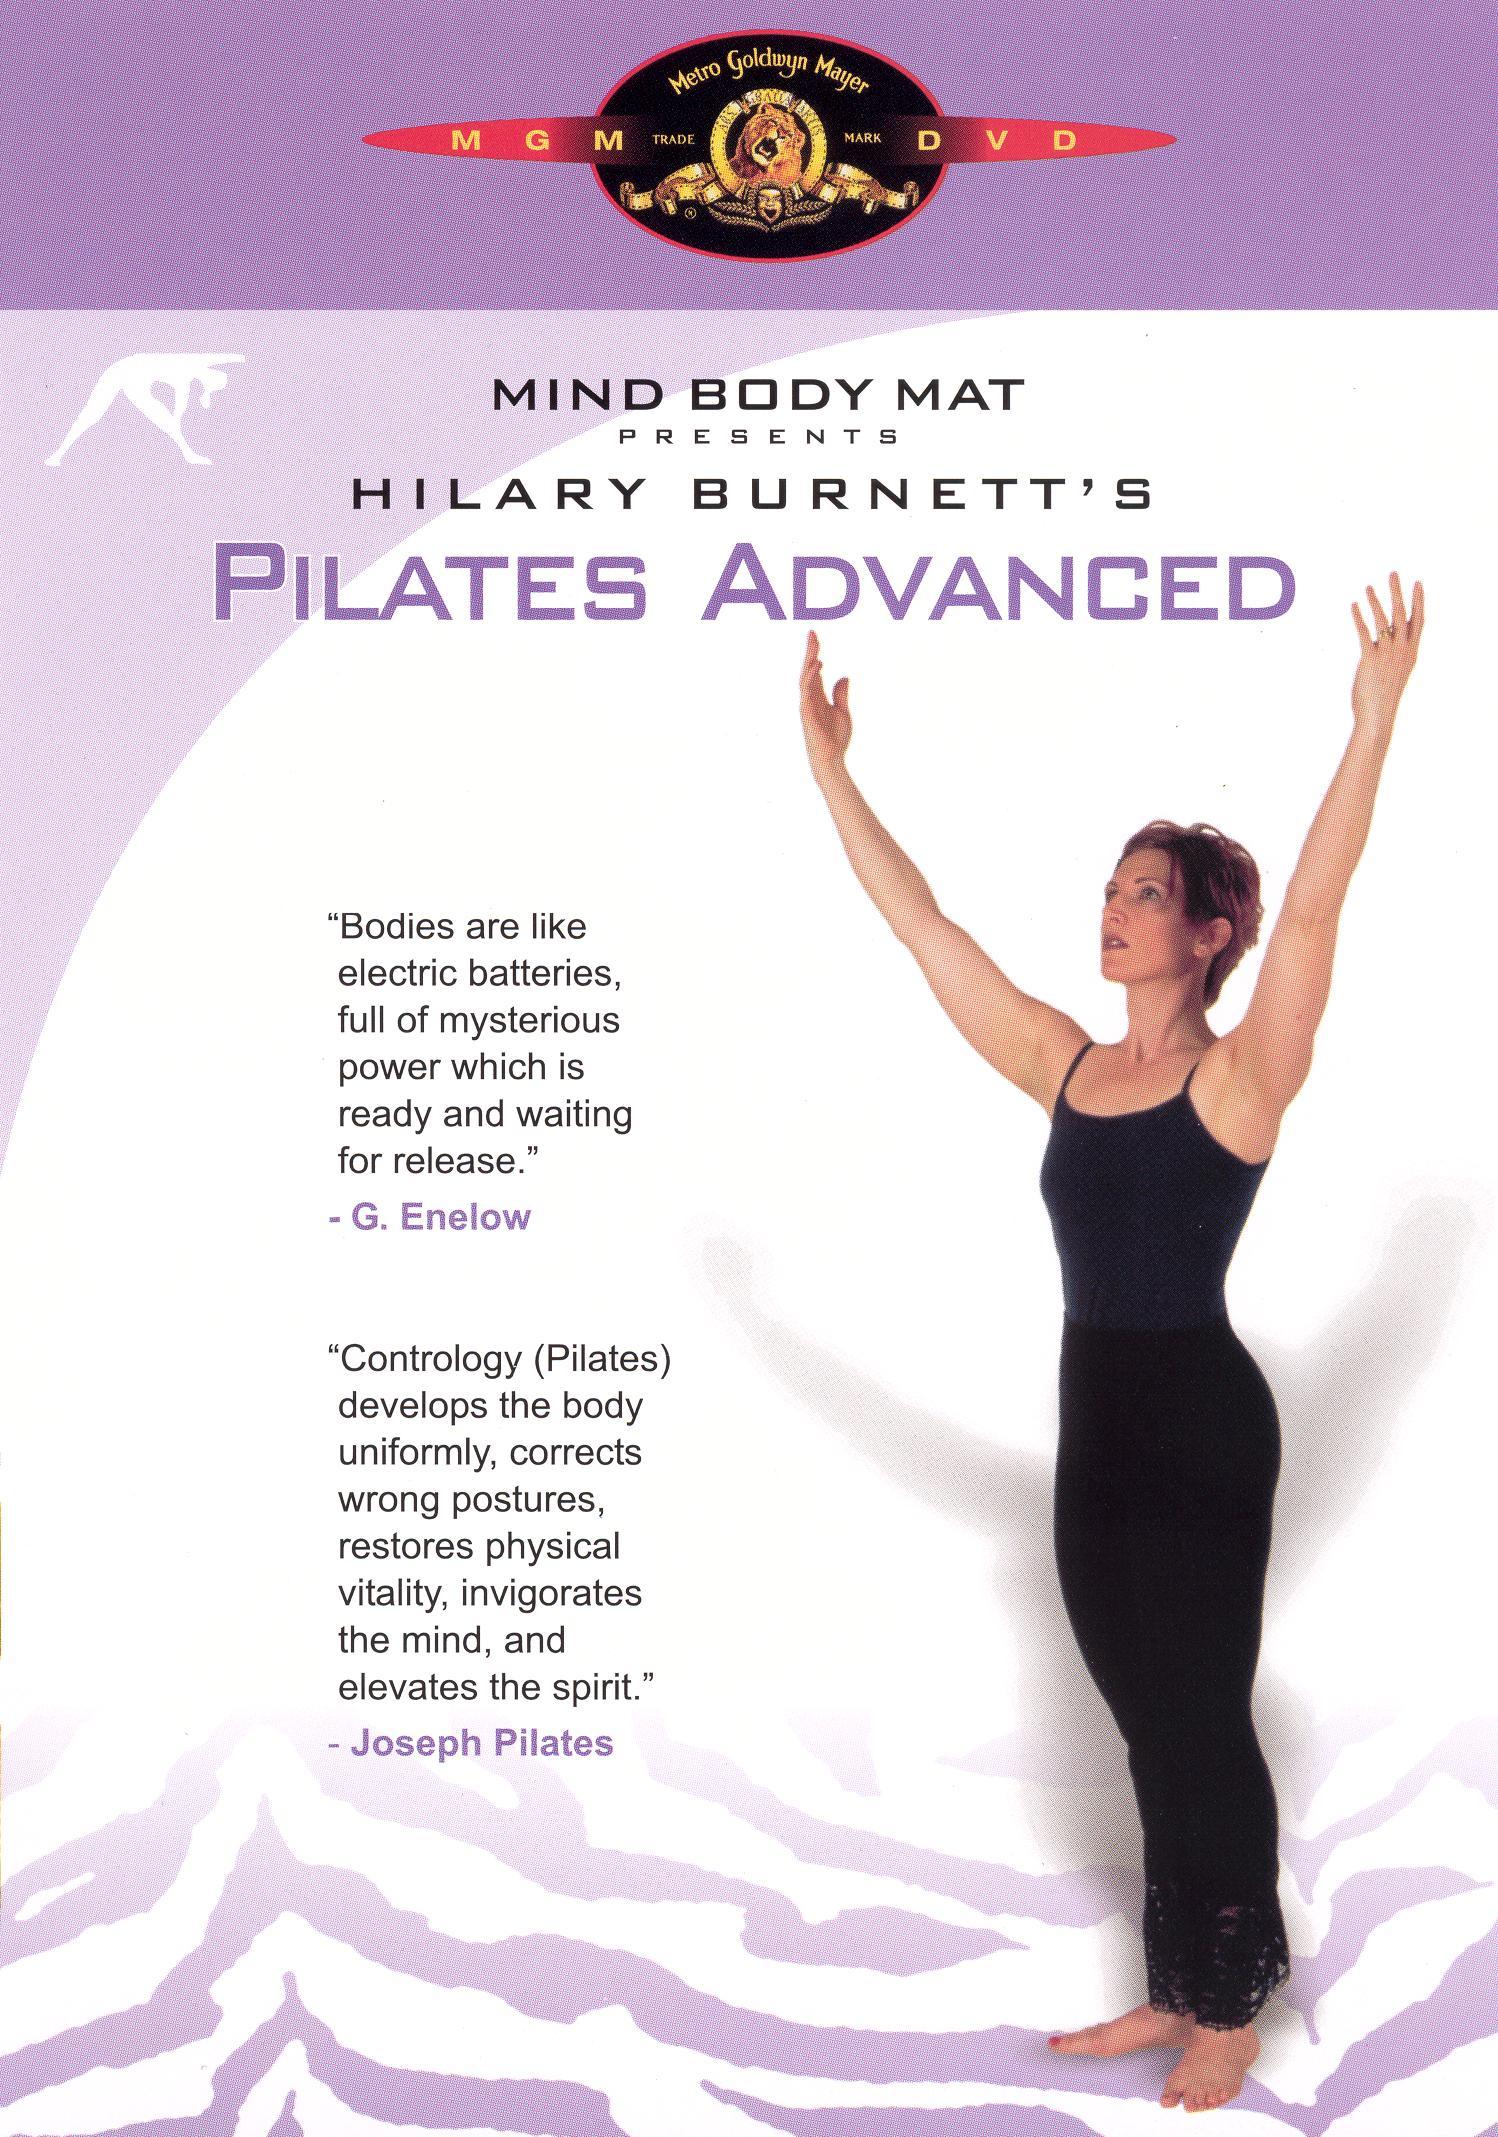 Mind Body Mat Presents: Hilary Burnett's Pilates Advanced